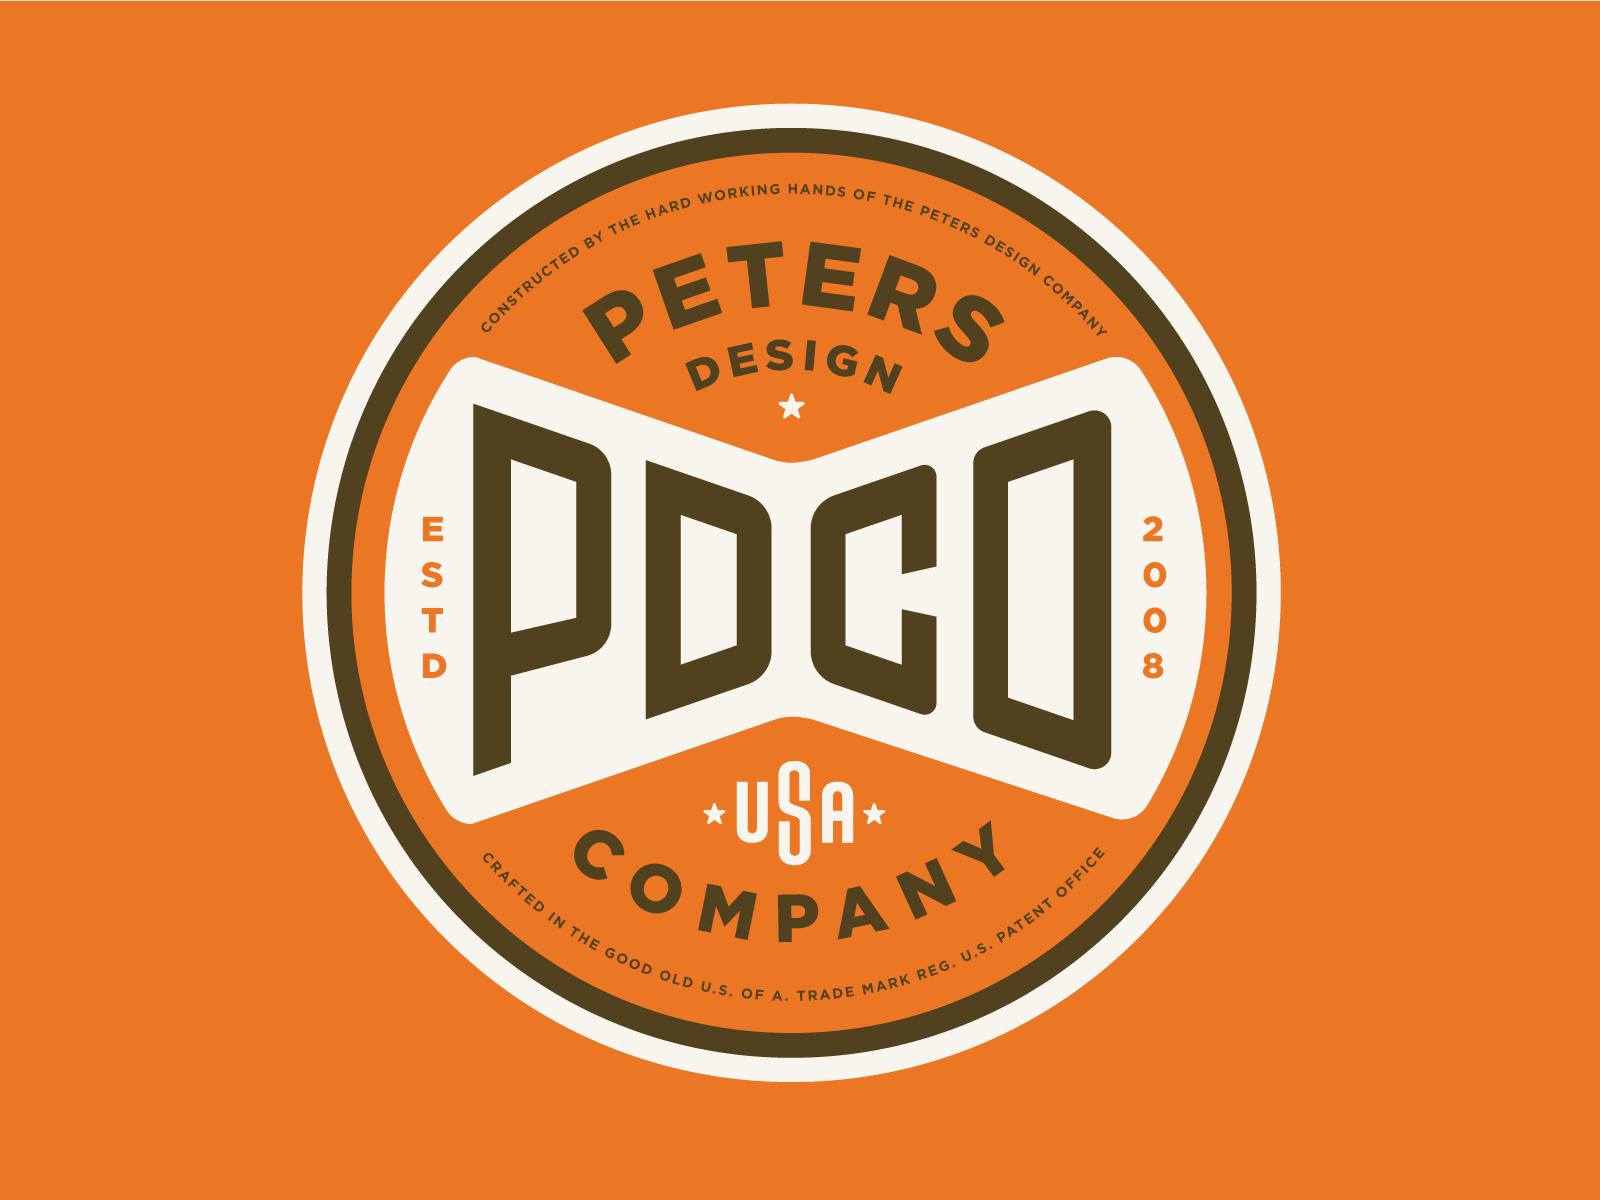 pdco_circlebadge_big_revised.png